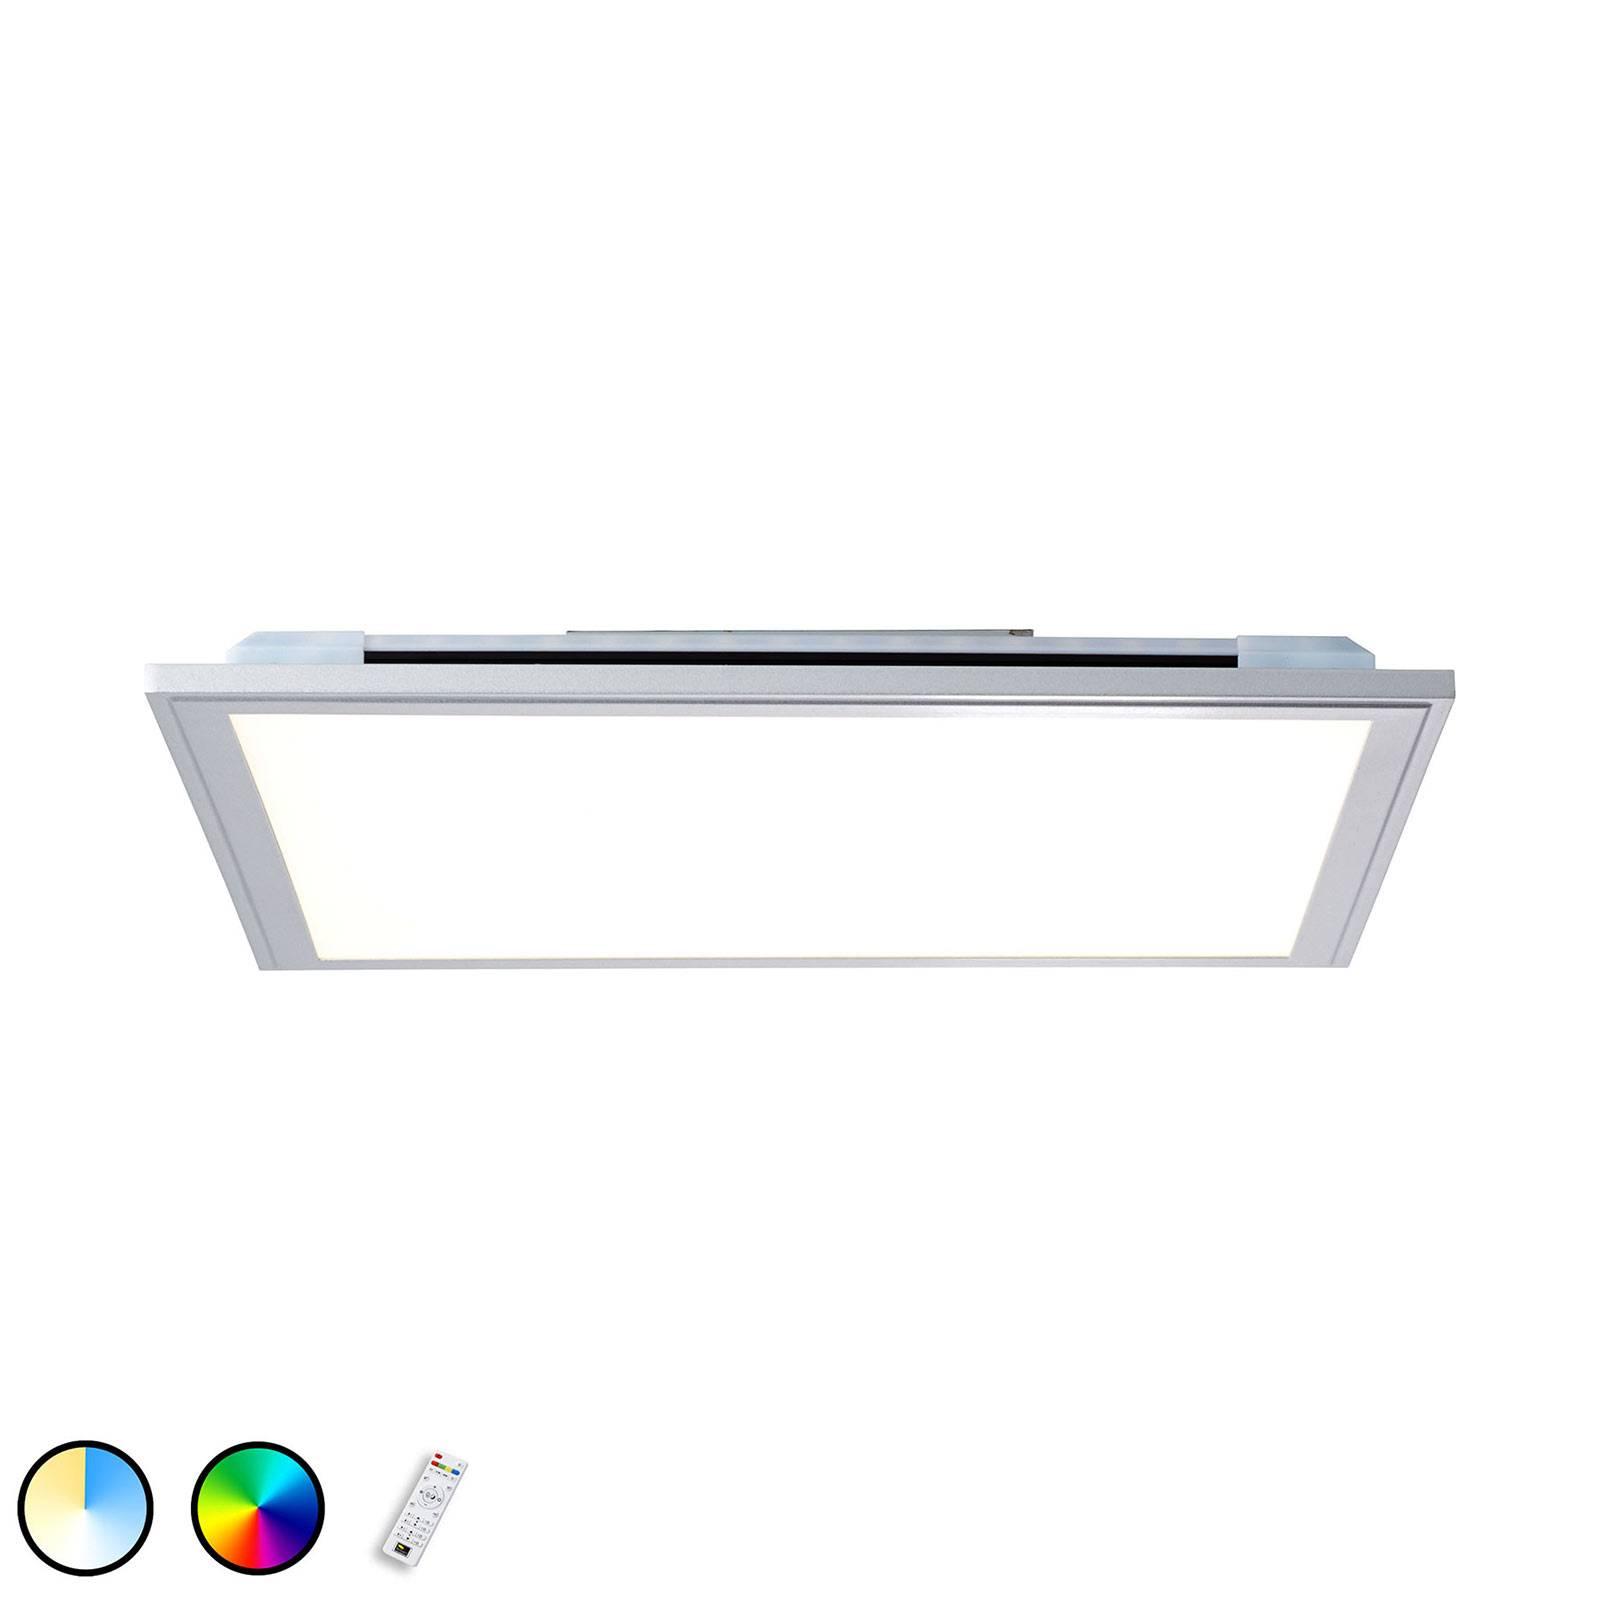 LED-kattovalaisin Alissa, 39,5 x 39,5 cm